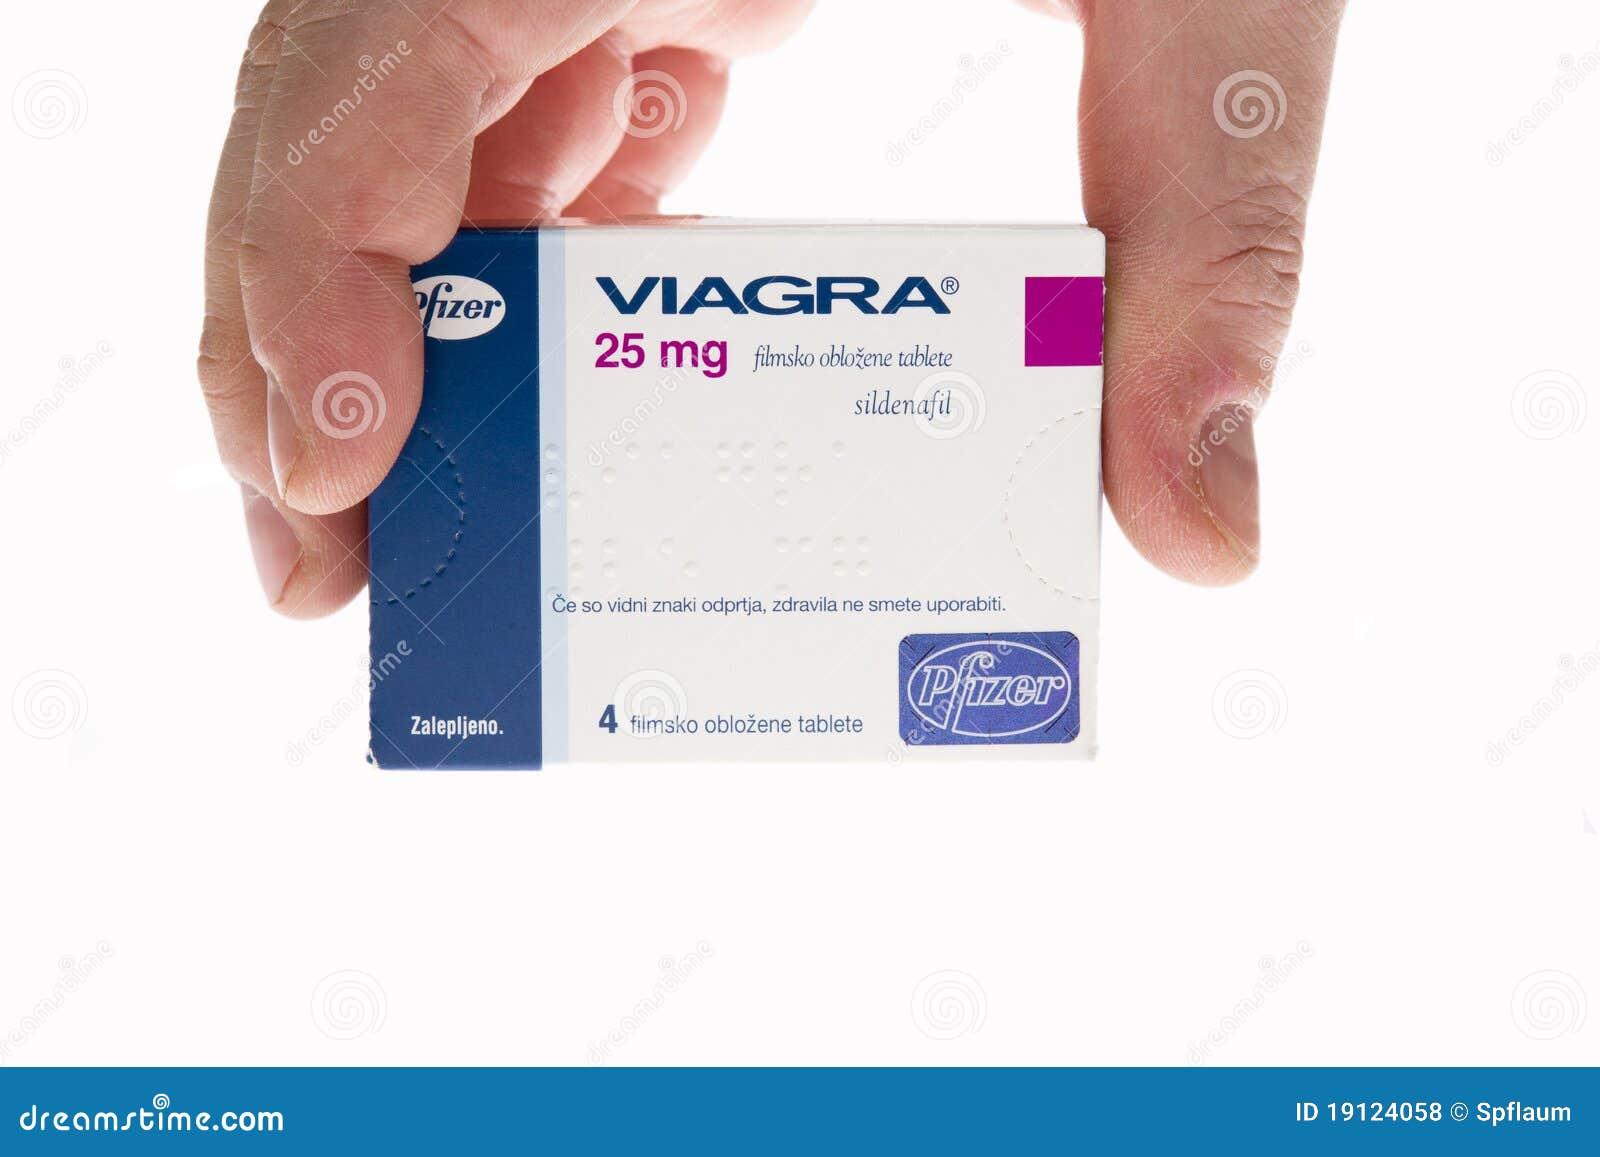 Viagra Pills Time